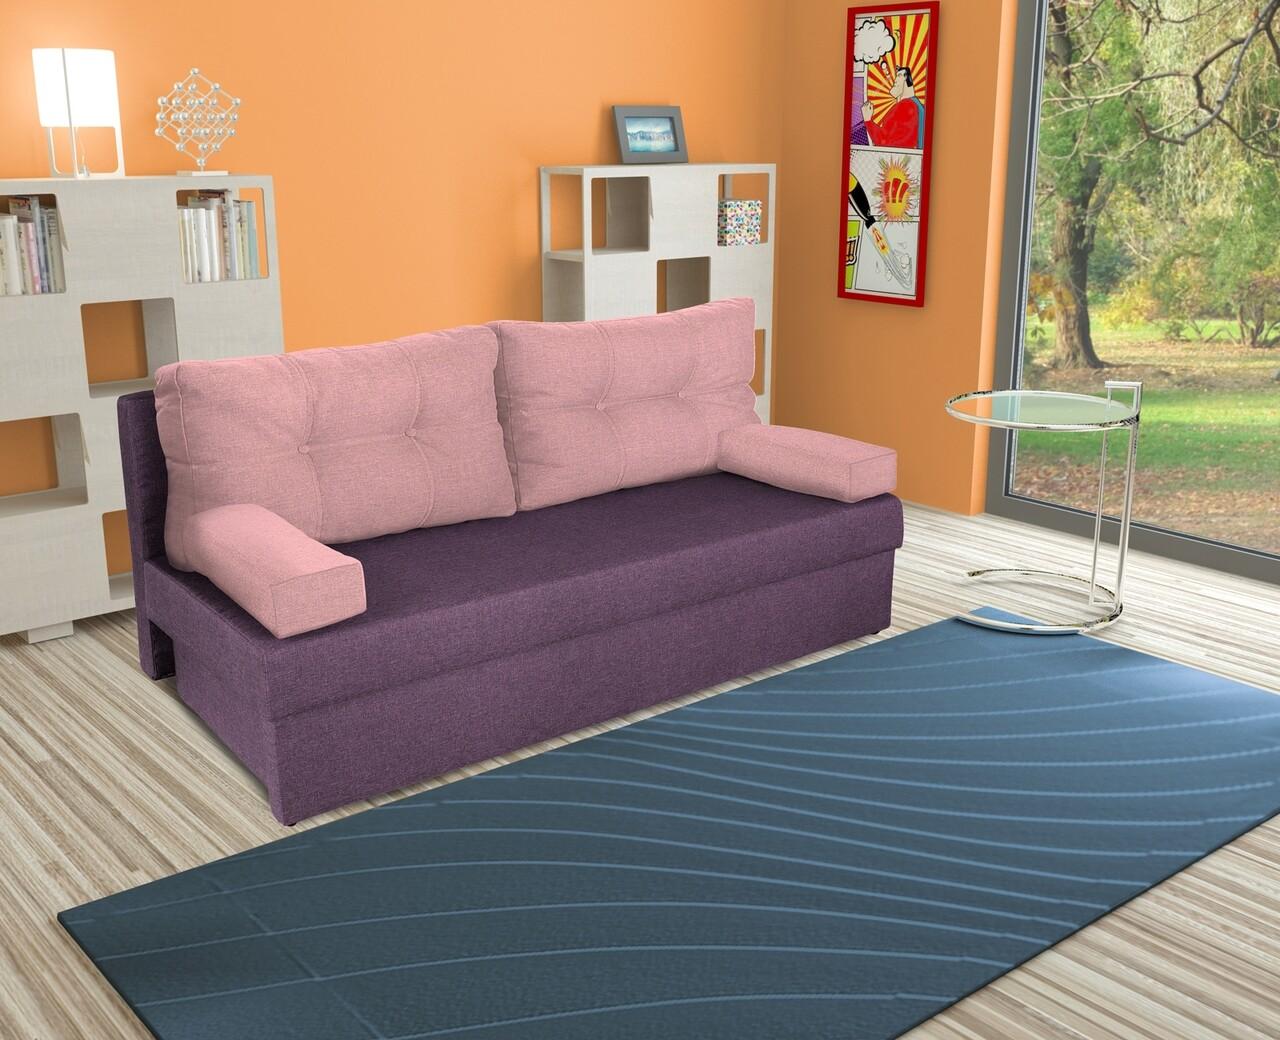 Canapea extensibila Alfi 192x80x77 cm cu lada de depozitare, Purple/Pink Flamingo